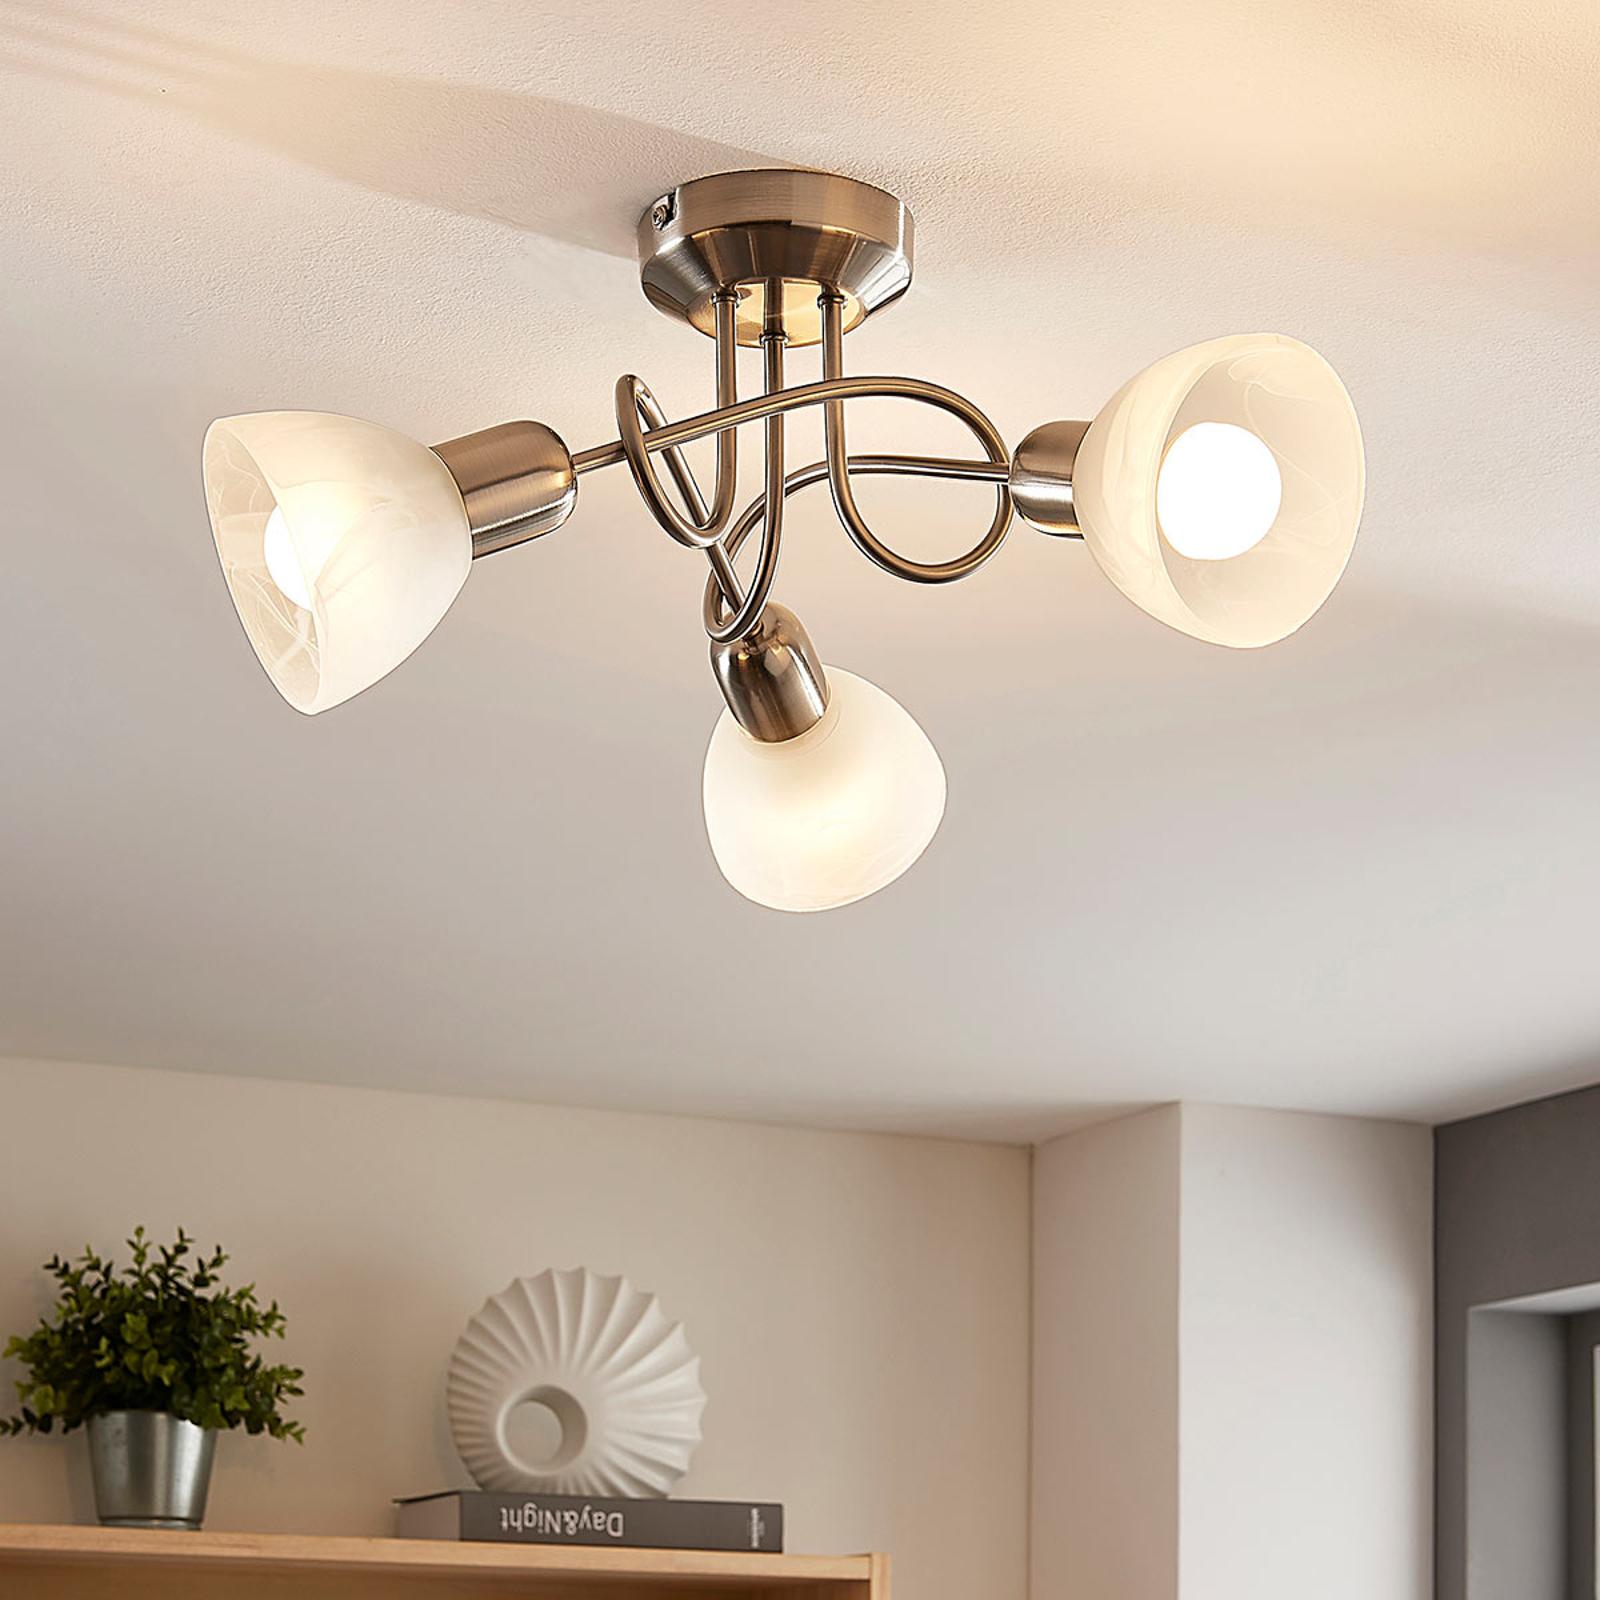 Lindby Paulina lampa sufitowa LED, 3-pkt., okrągła